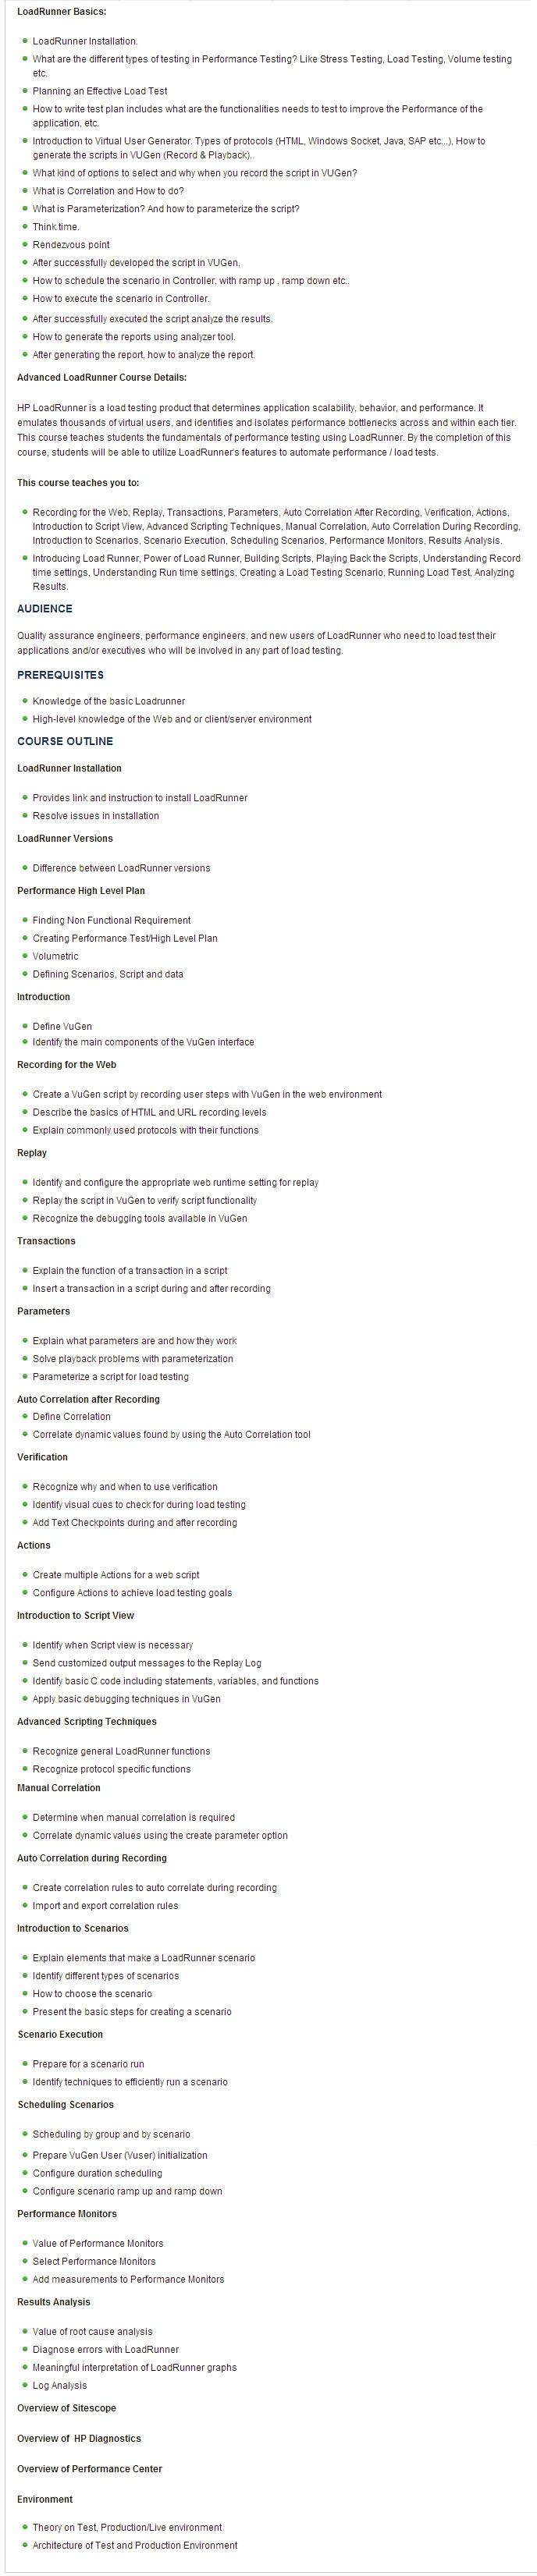 loadrunner-course-syllabus